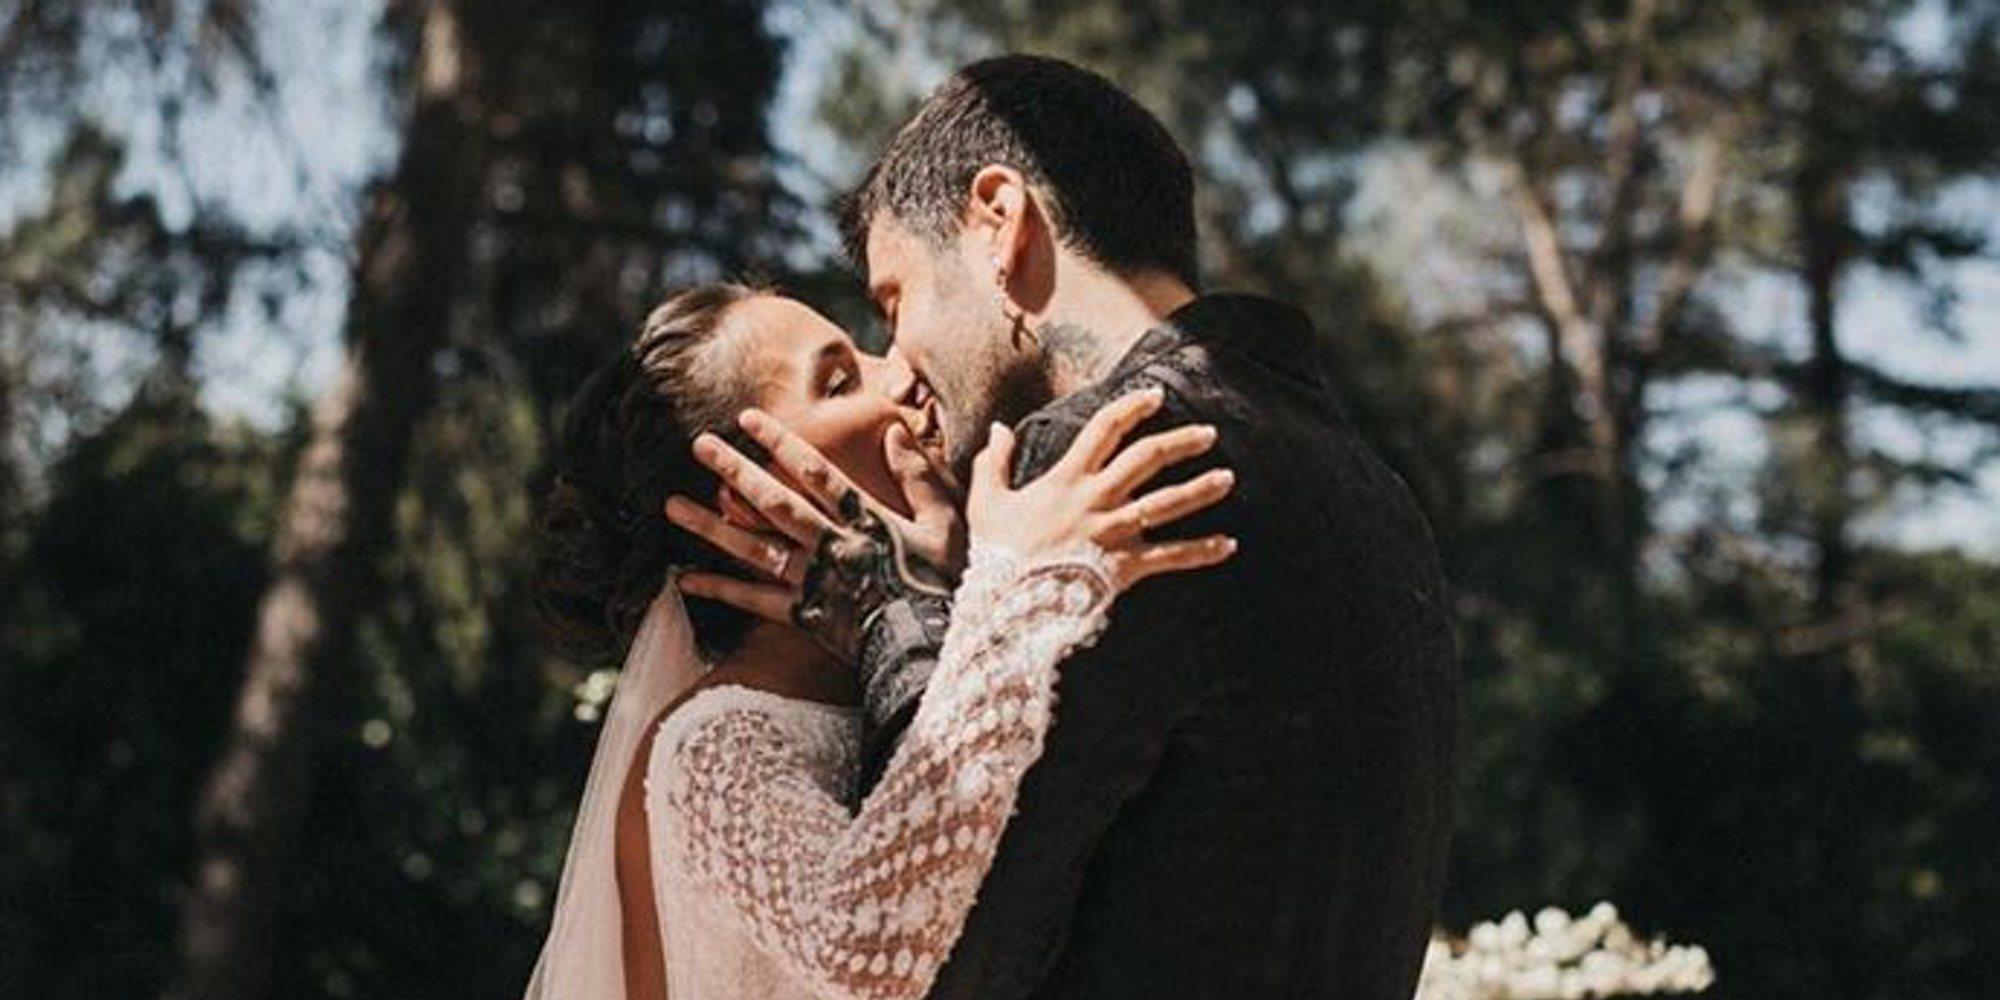 Julia Nakamatsu enseña algunos detalles de su preciosa boda con Melendi en un castillo de cuento